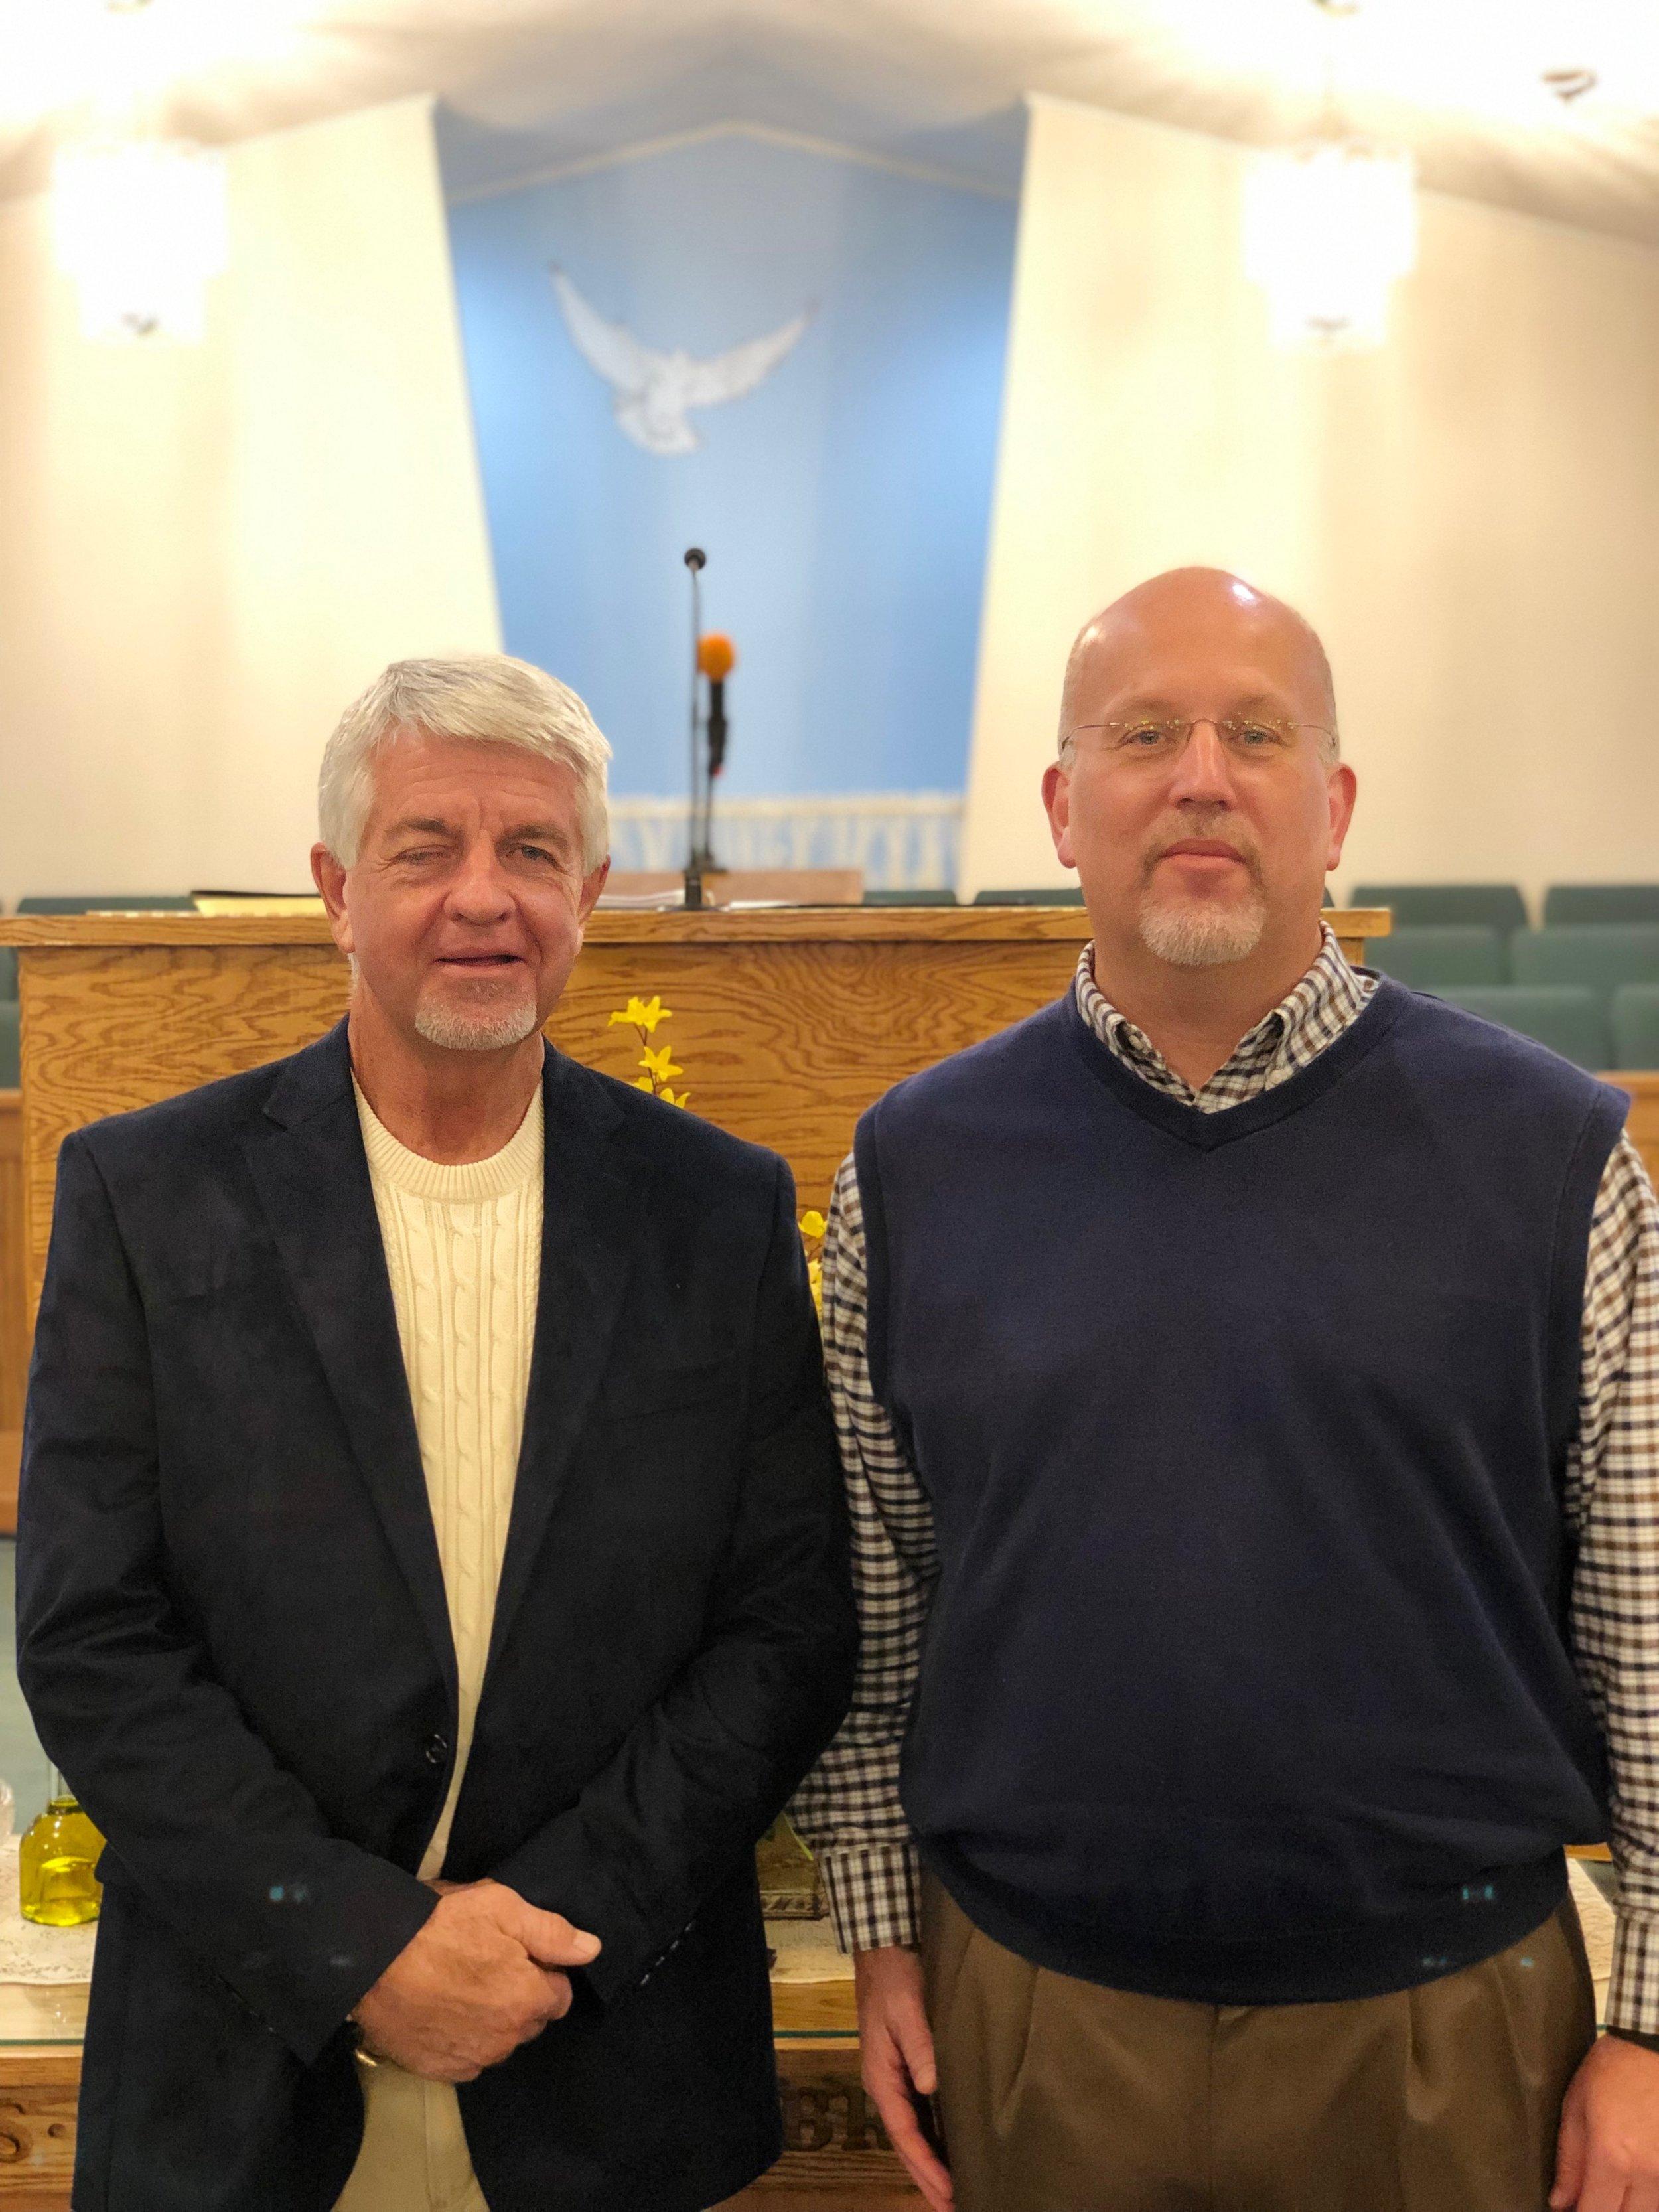 Assistant Choir Director  - Dan Hughes,  Choir Director  - Greg Fullbright